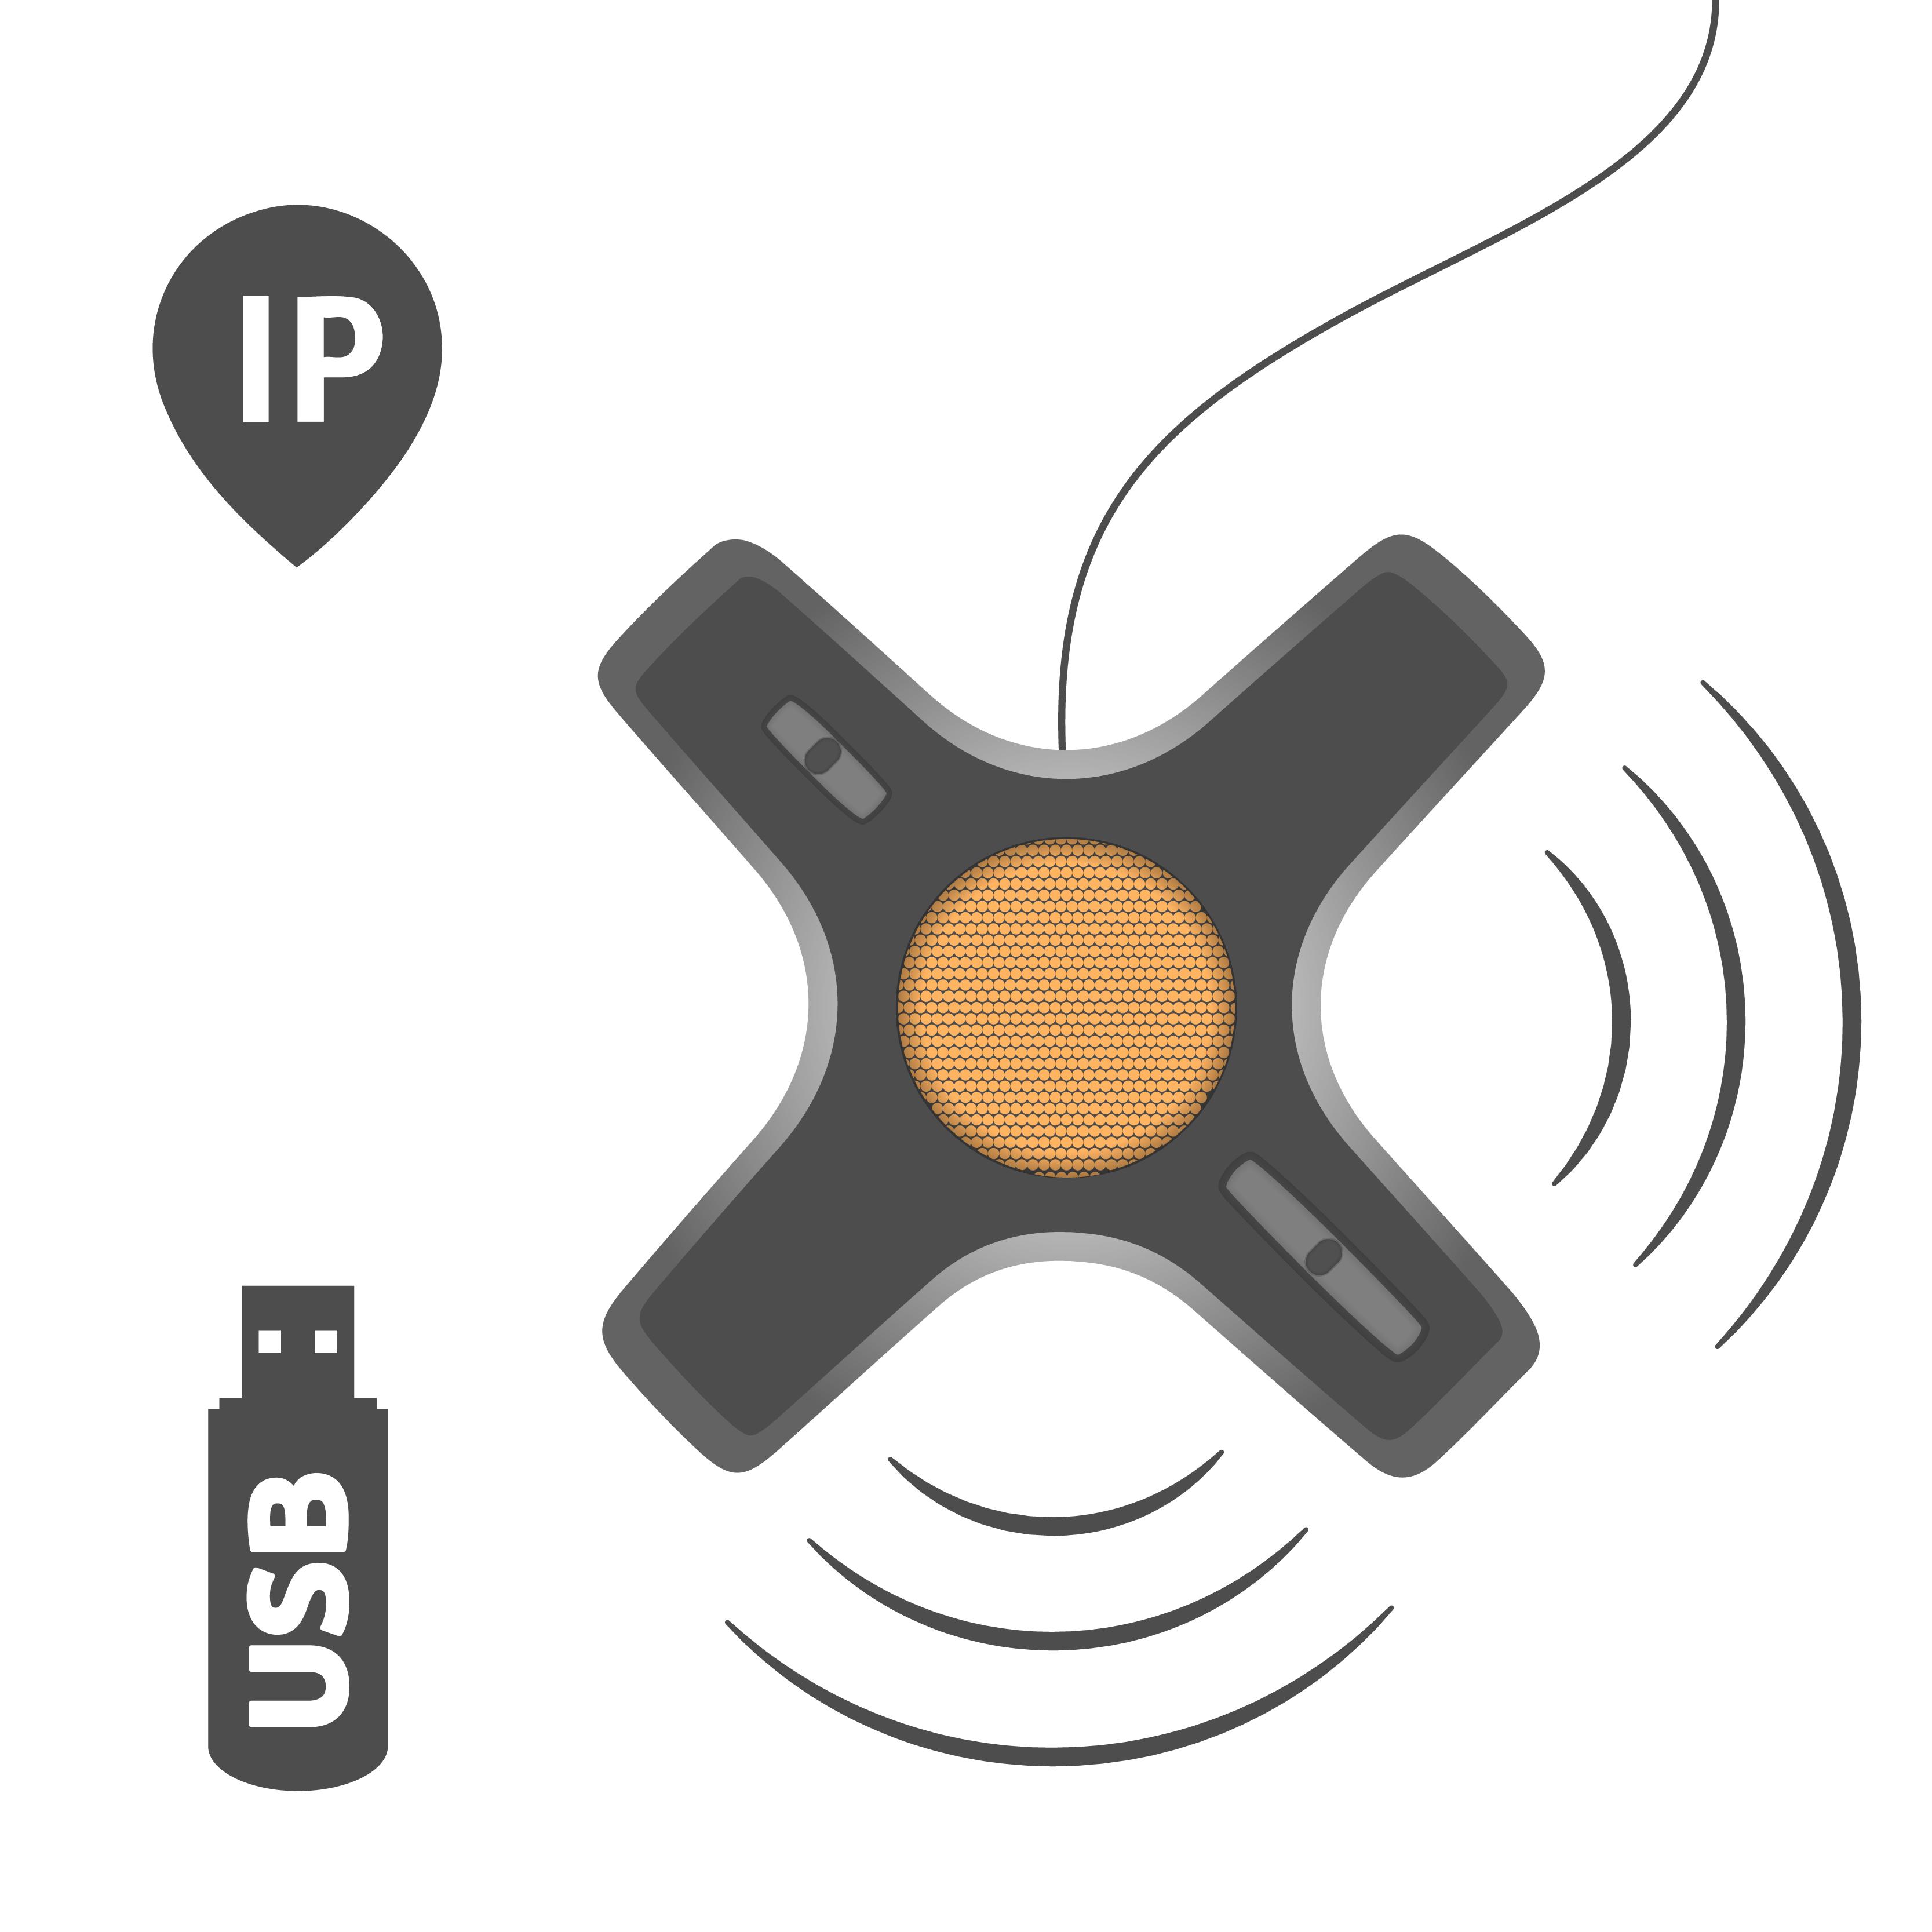 HSW_ICON_Audiokonf_IP_grau